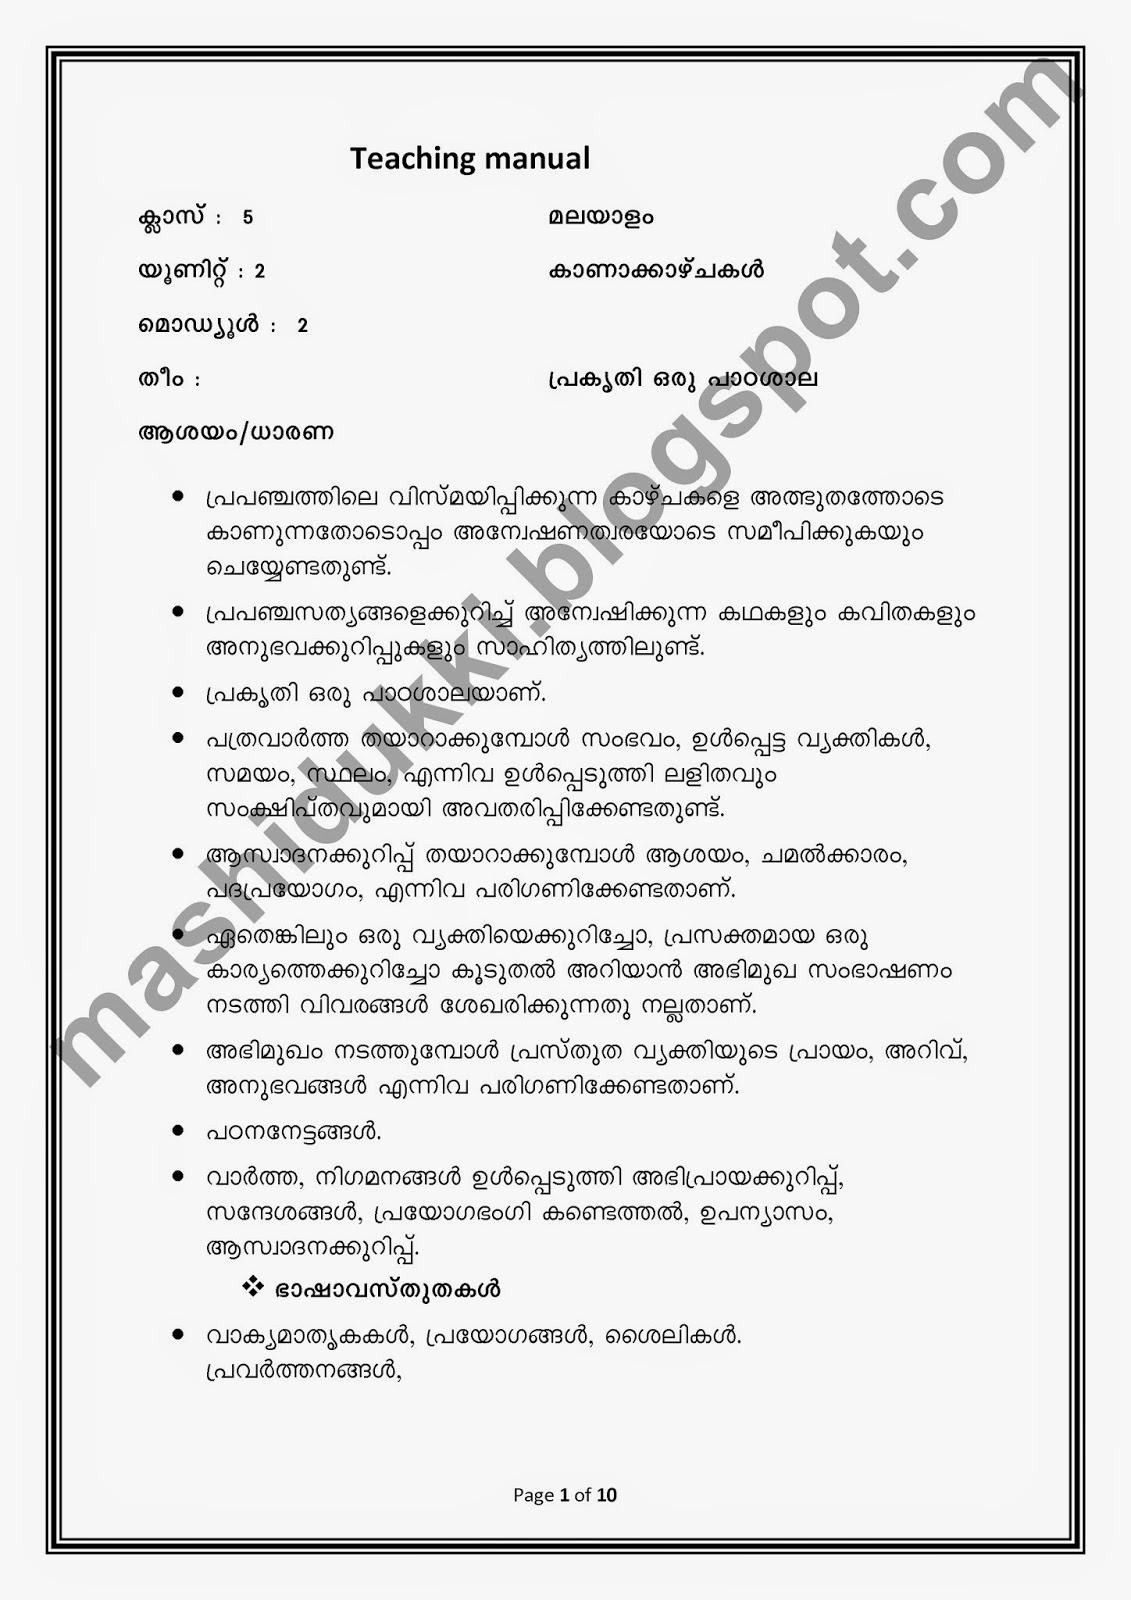 malayalam mash teaching manual std 5 module 2 rh malyalammashidukki blogspot com